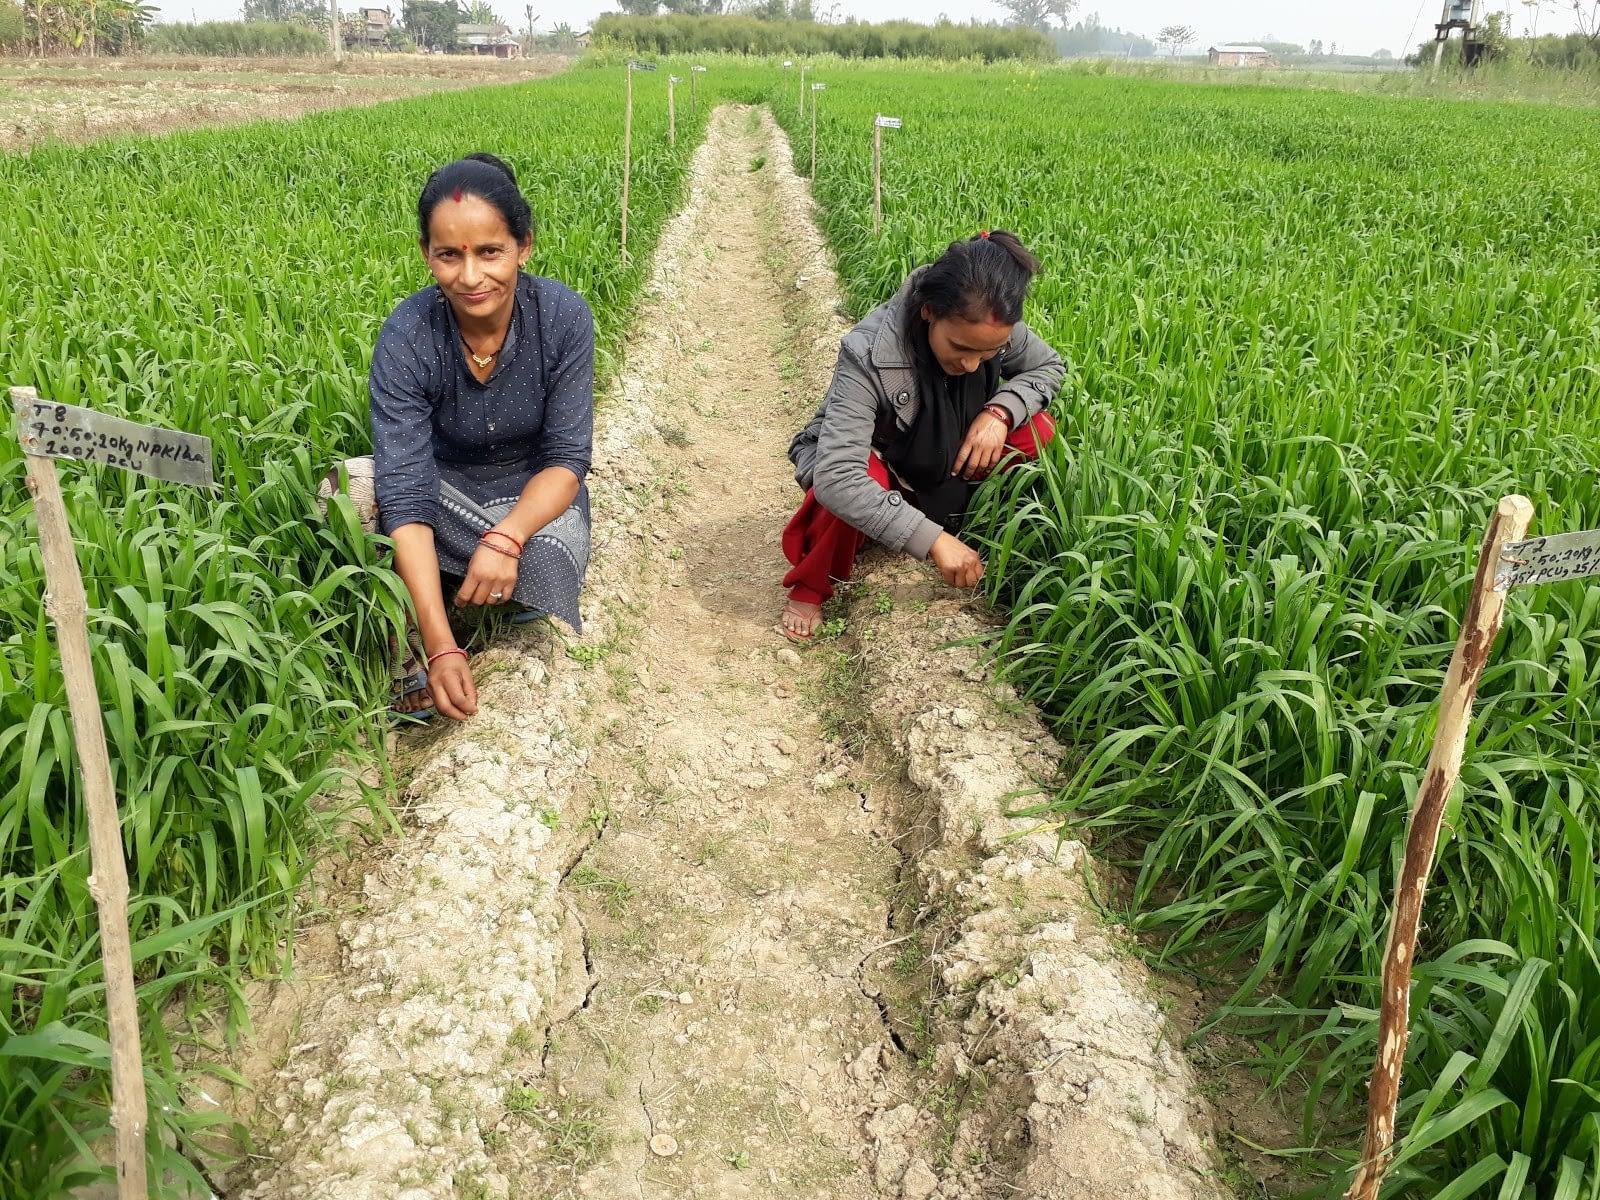 Farmers monitor wheat fields in Bardiya district, Nepal. (Photo: Surya B. Thapa/CIMMYT)